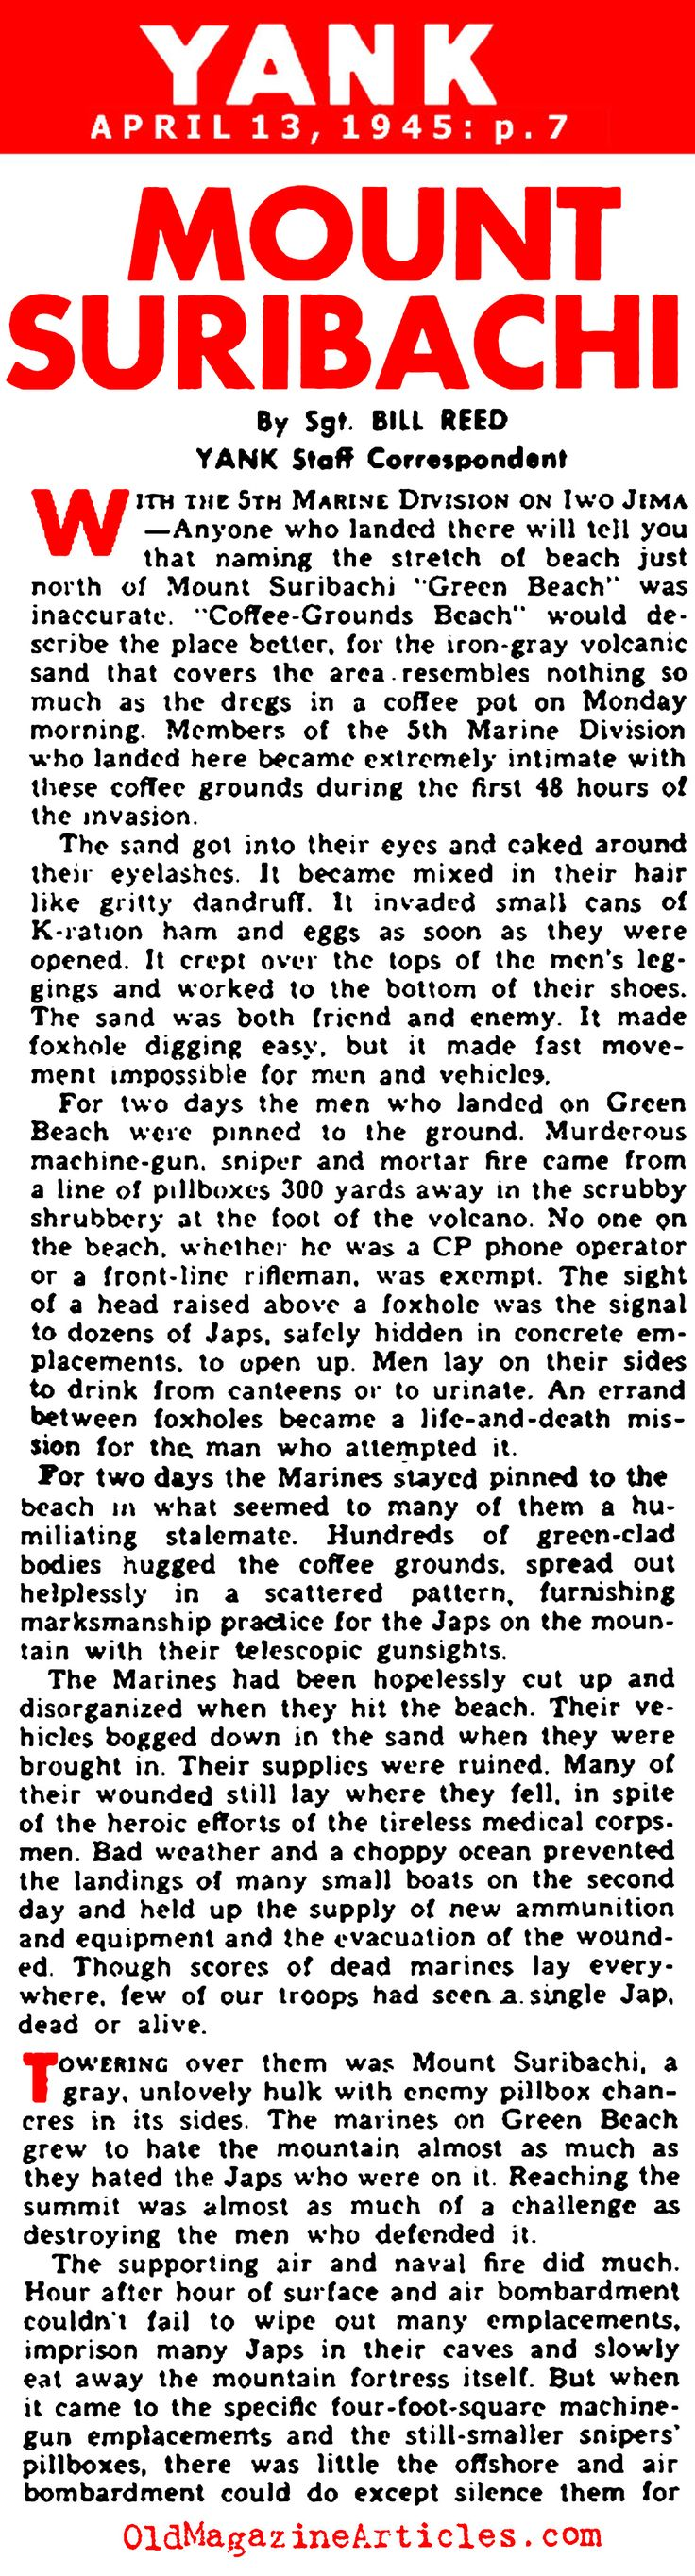 The Battle of Iwo Jima and the First Flag Raising on Mount Suribachi (Yank Magazine, 1945)